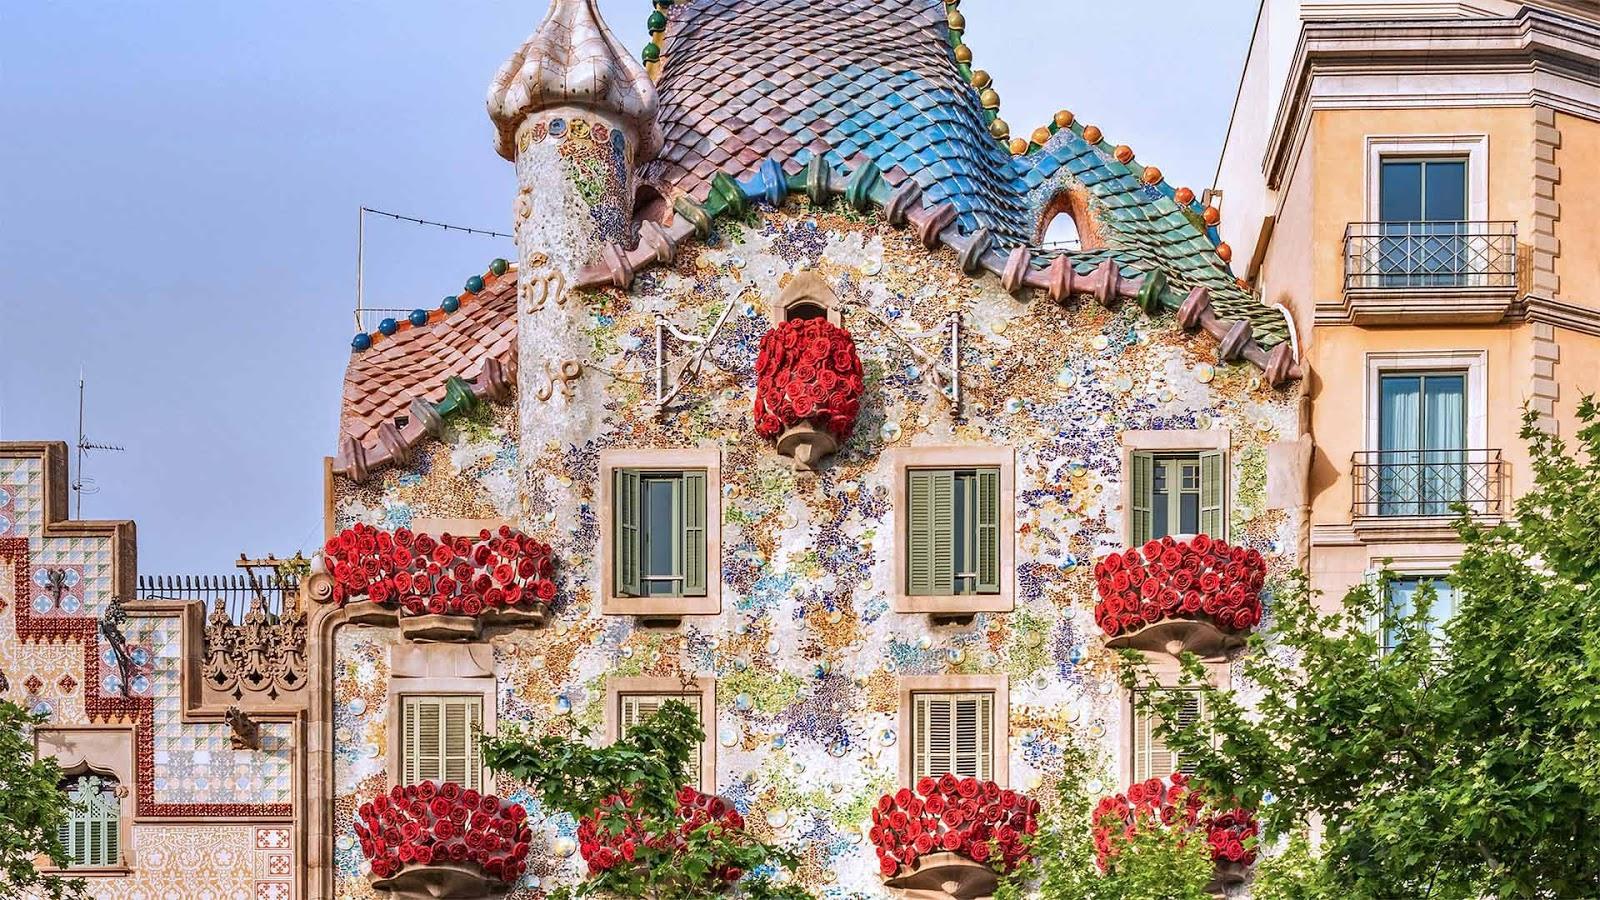 Casa Batlló, Barcelona, Spain © Jon Arnold Images Ltd/Alamy